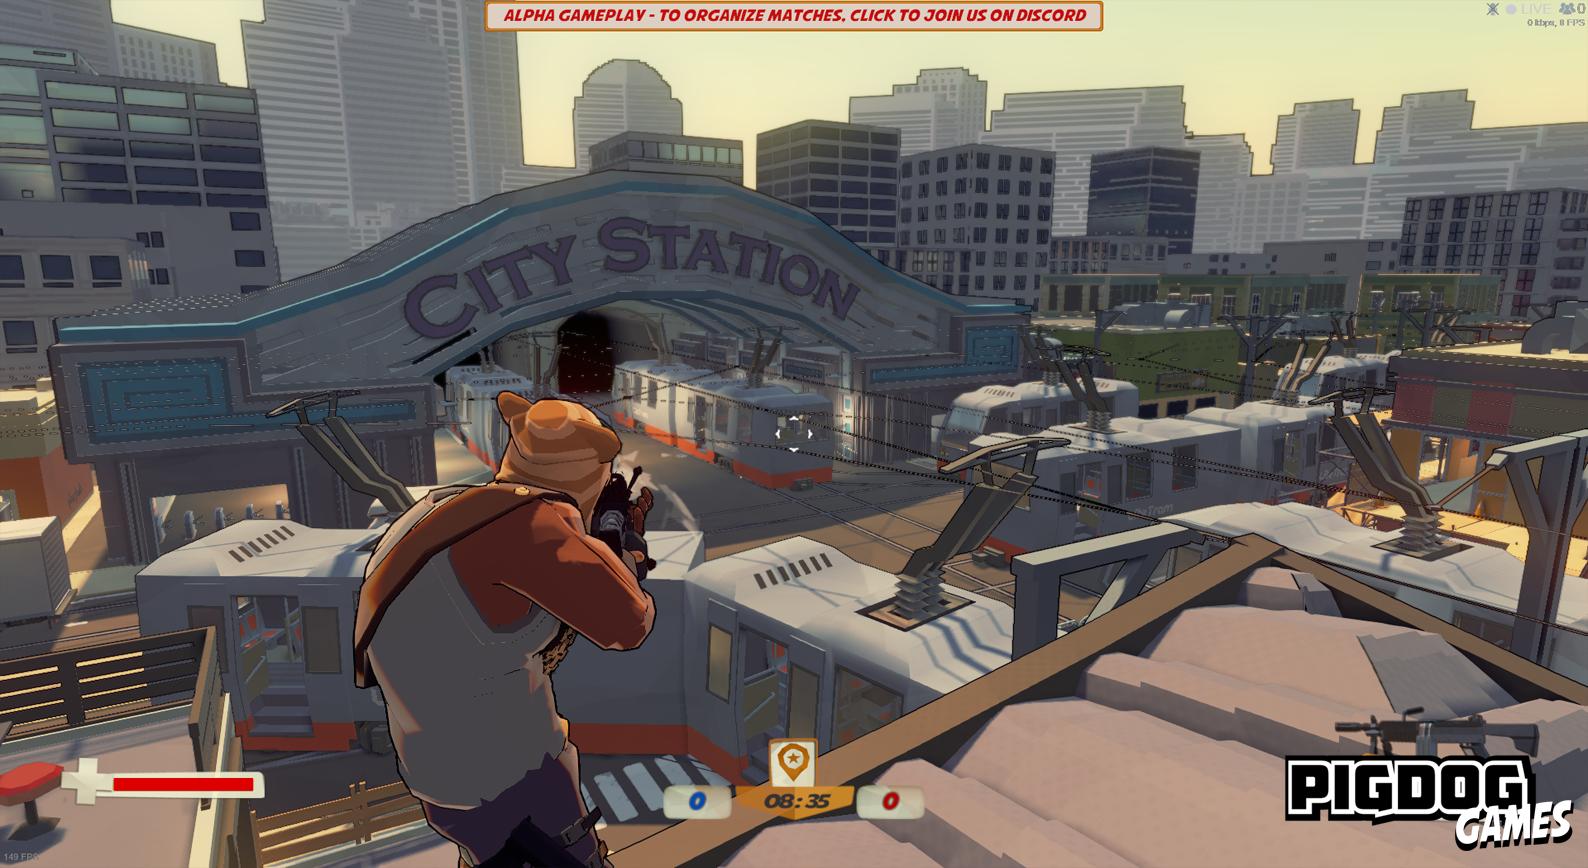 CityStation_03.png